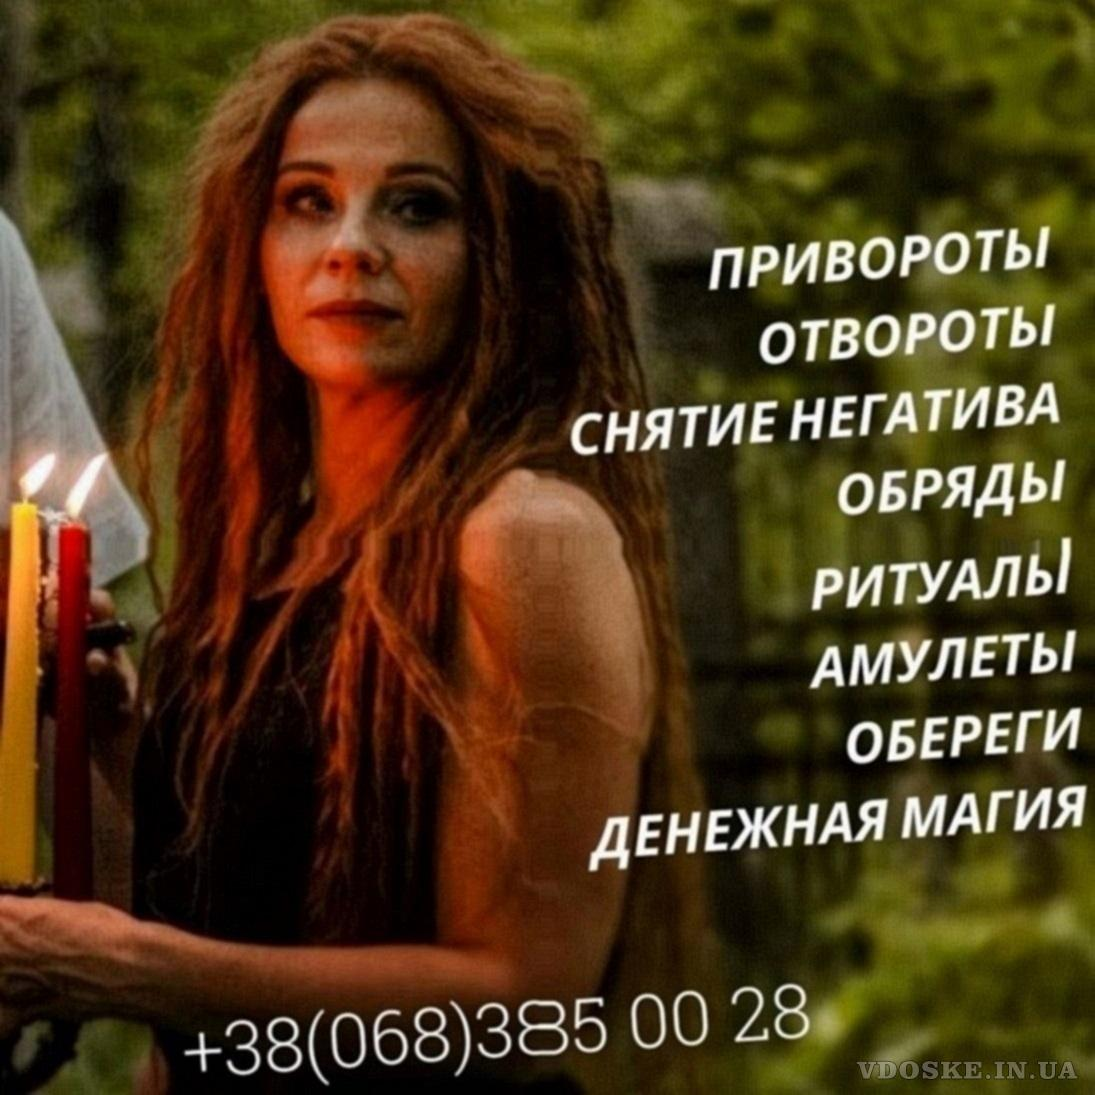 Сильный маг Киев. Гадание. Обряды. Ритуалы.